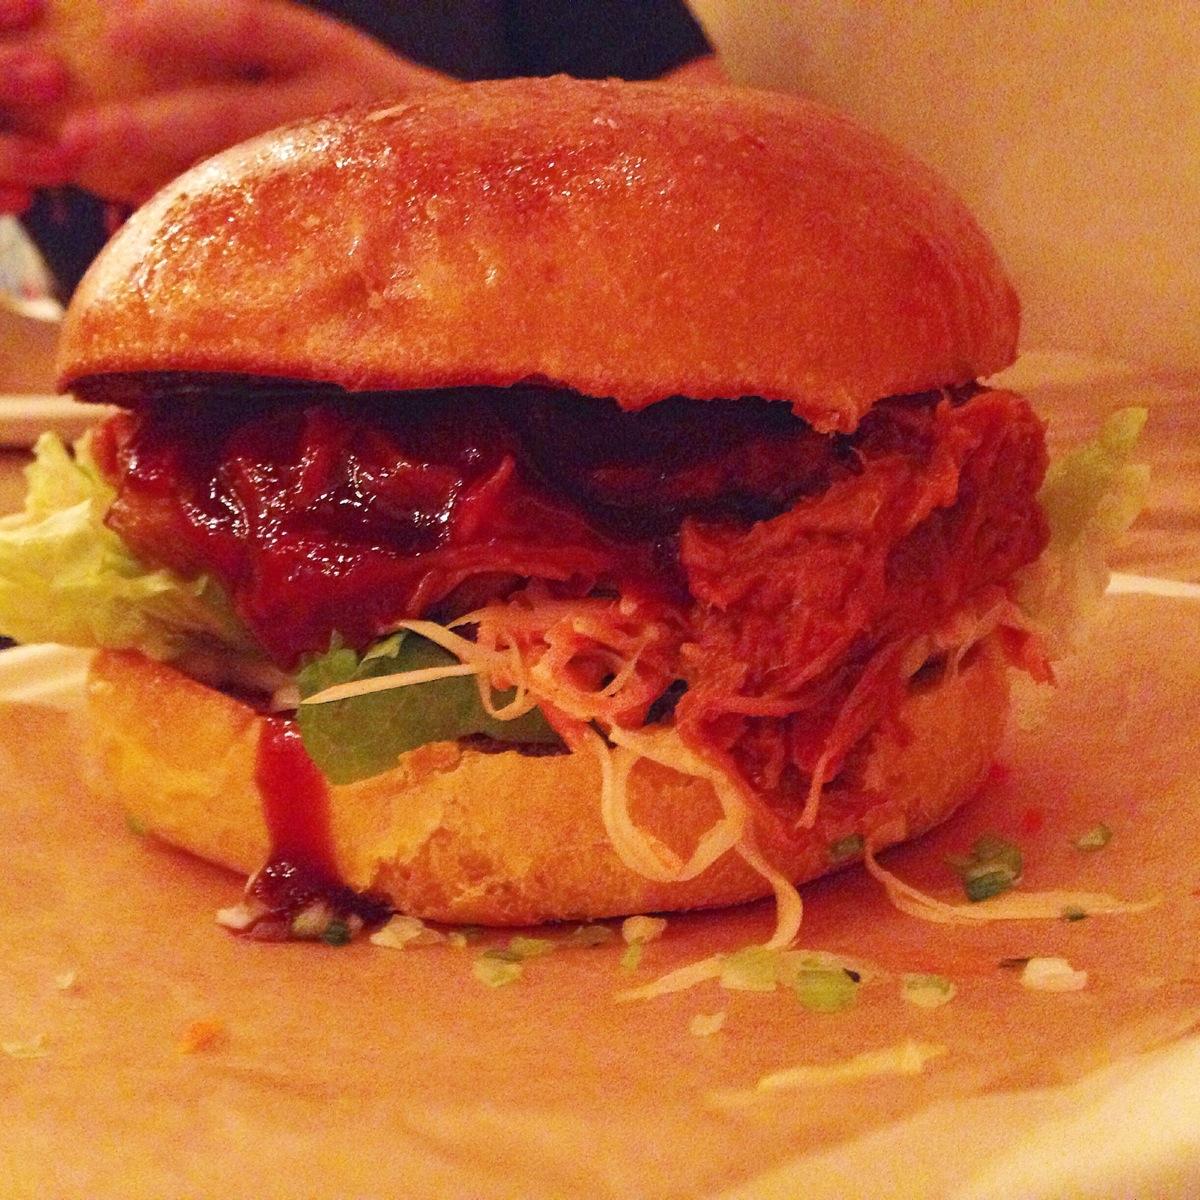 joint_burger